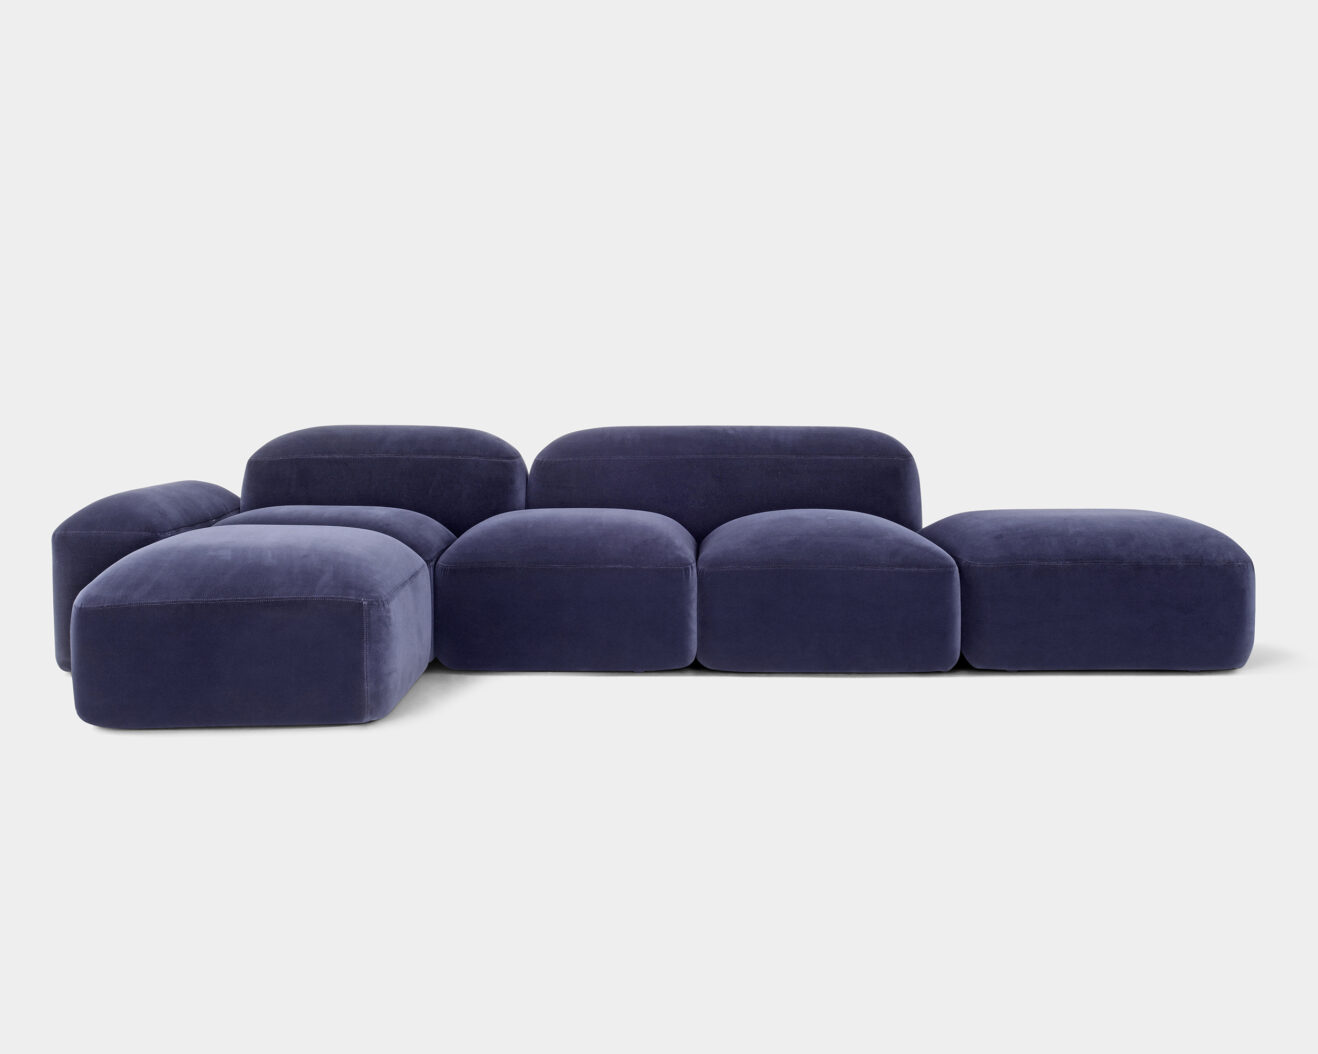 Lapis-sofa-amuralab-emanuel-gargano-3-2